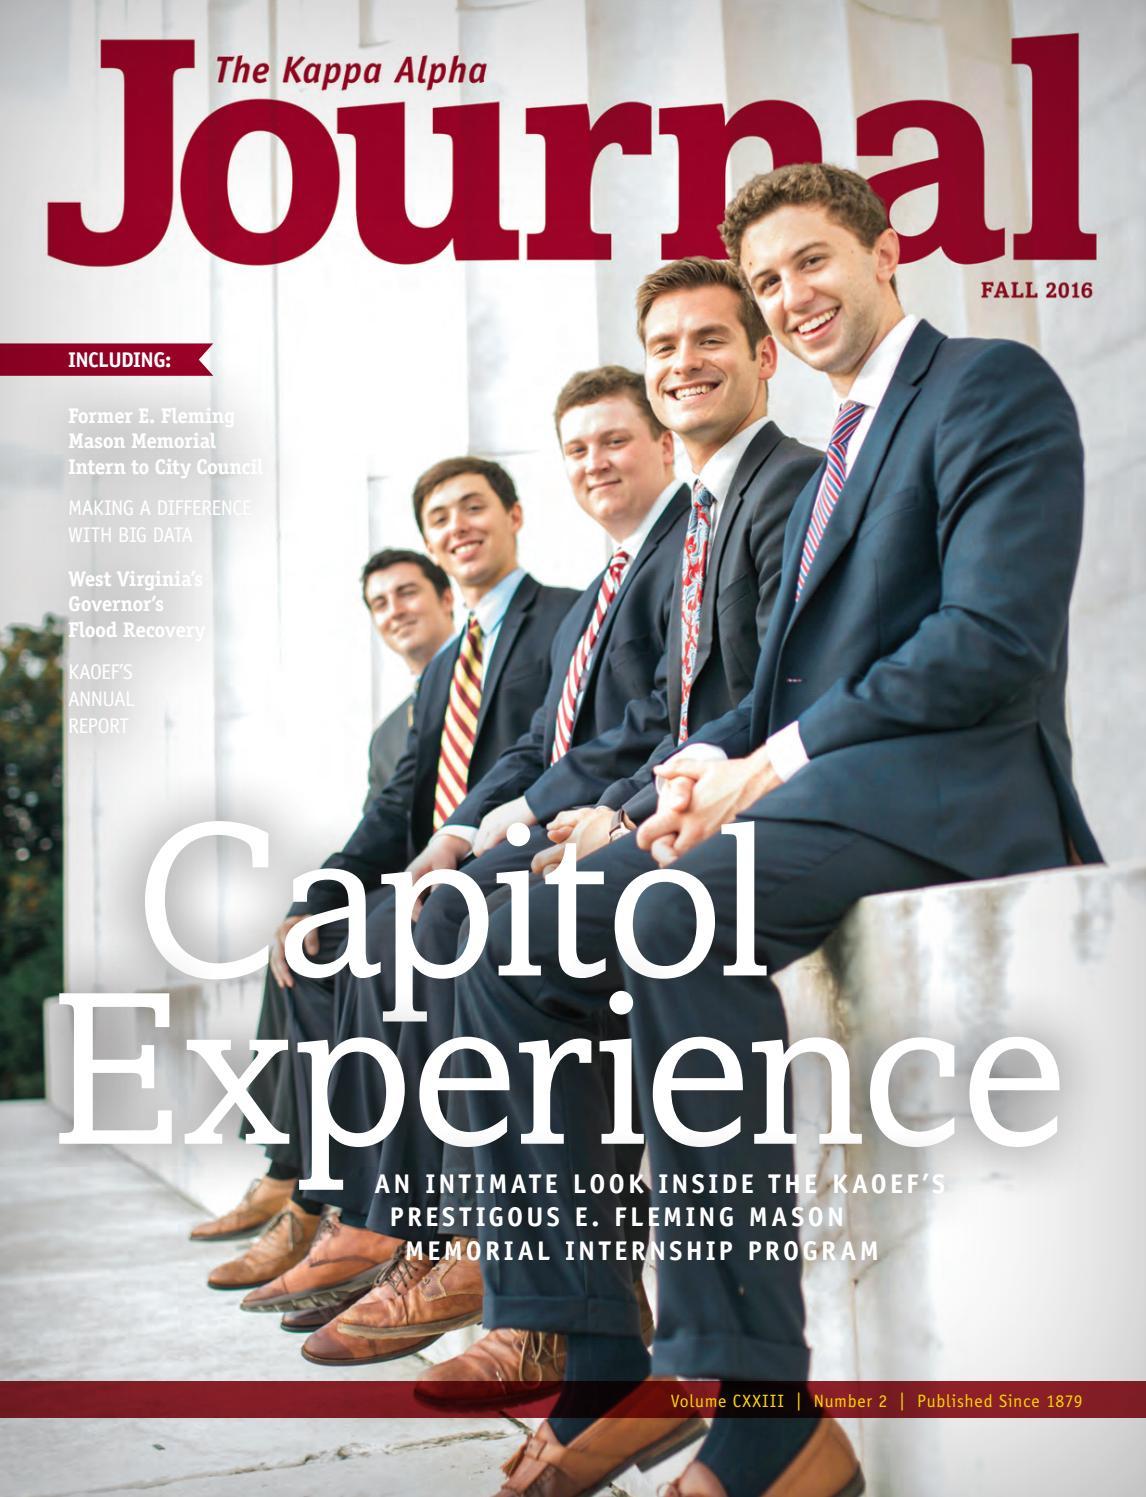 The Kappa Alpha Journal - Fall 2016 by Kappa Alpha Order - issuu